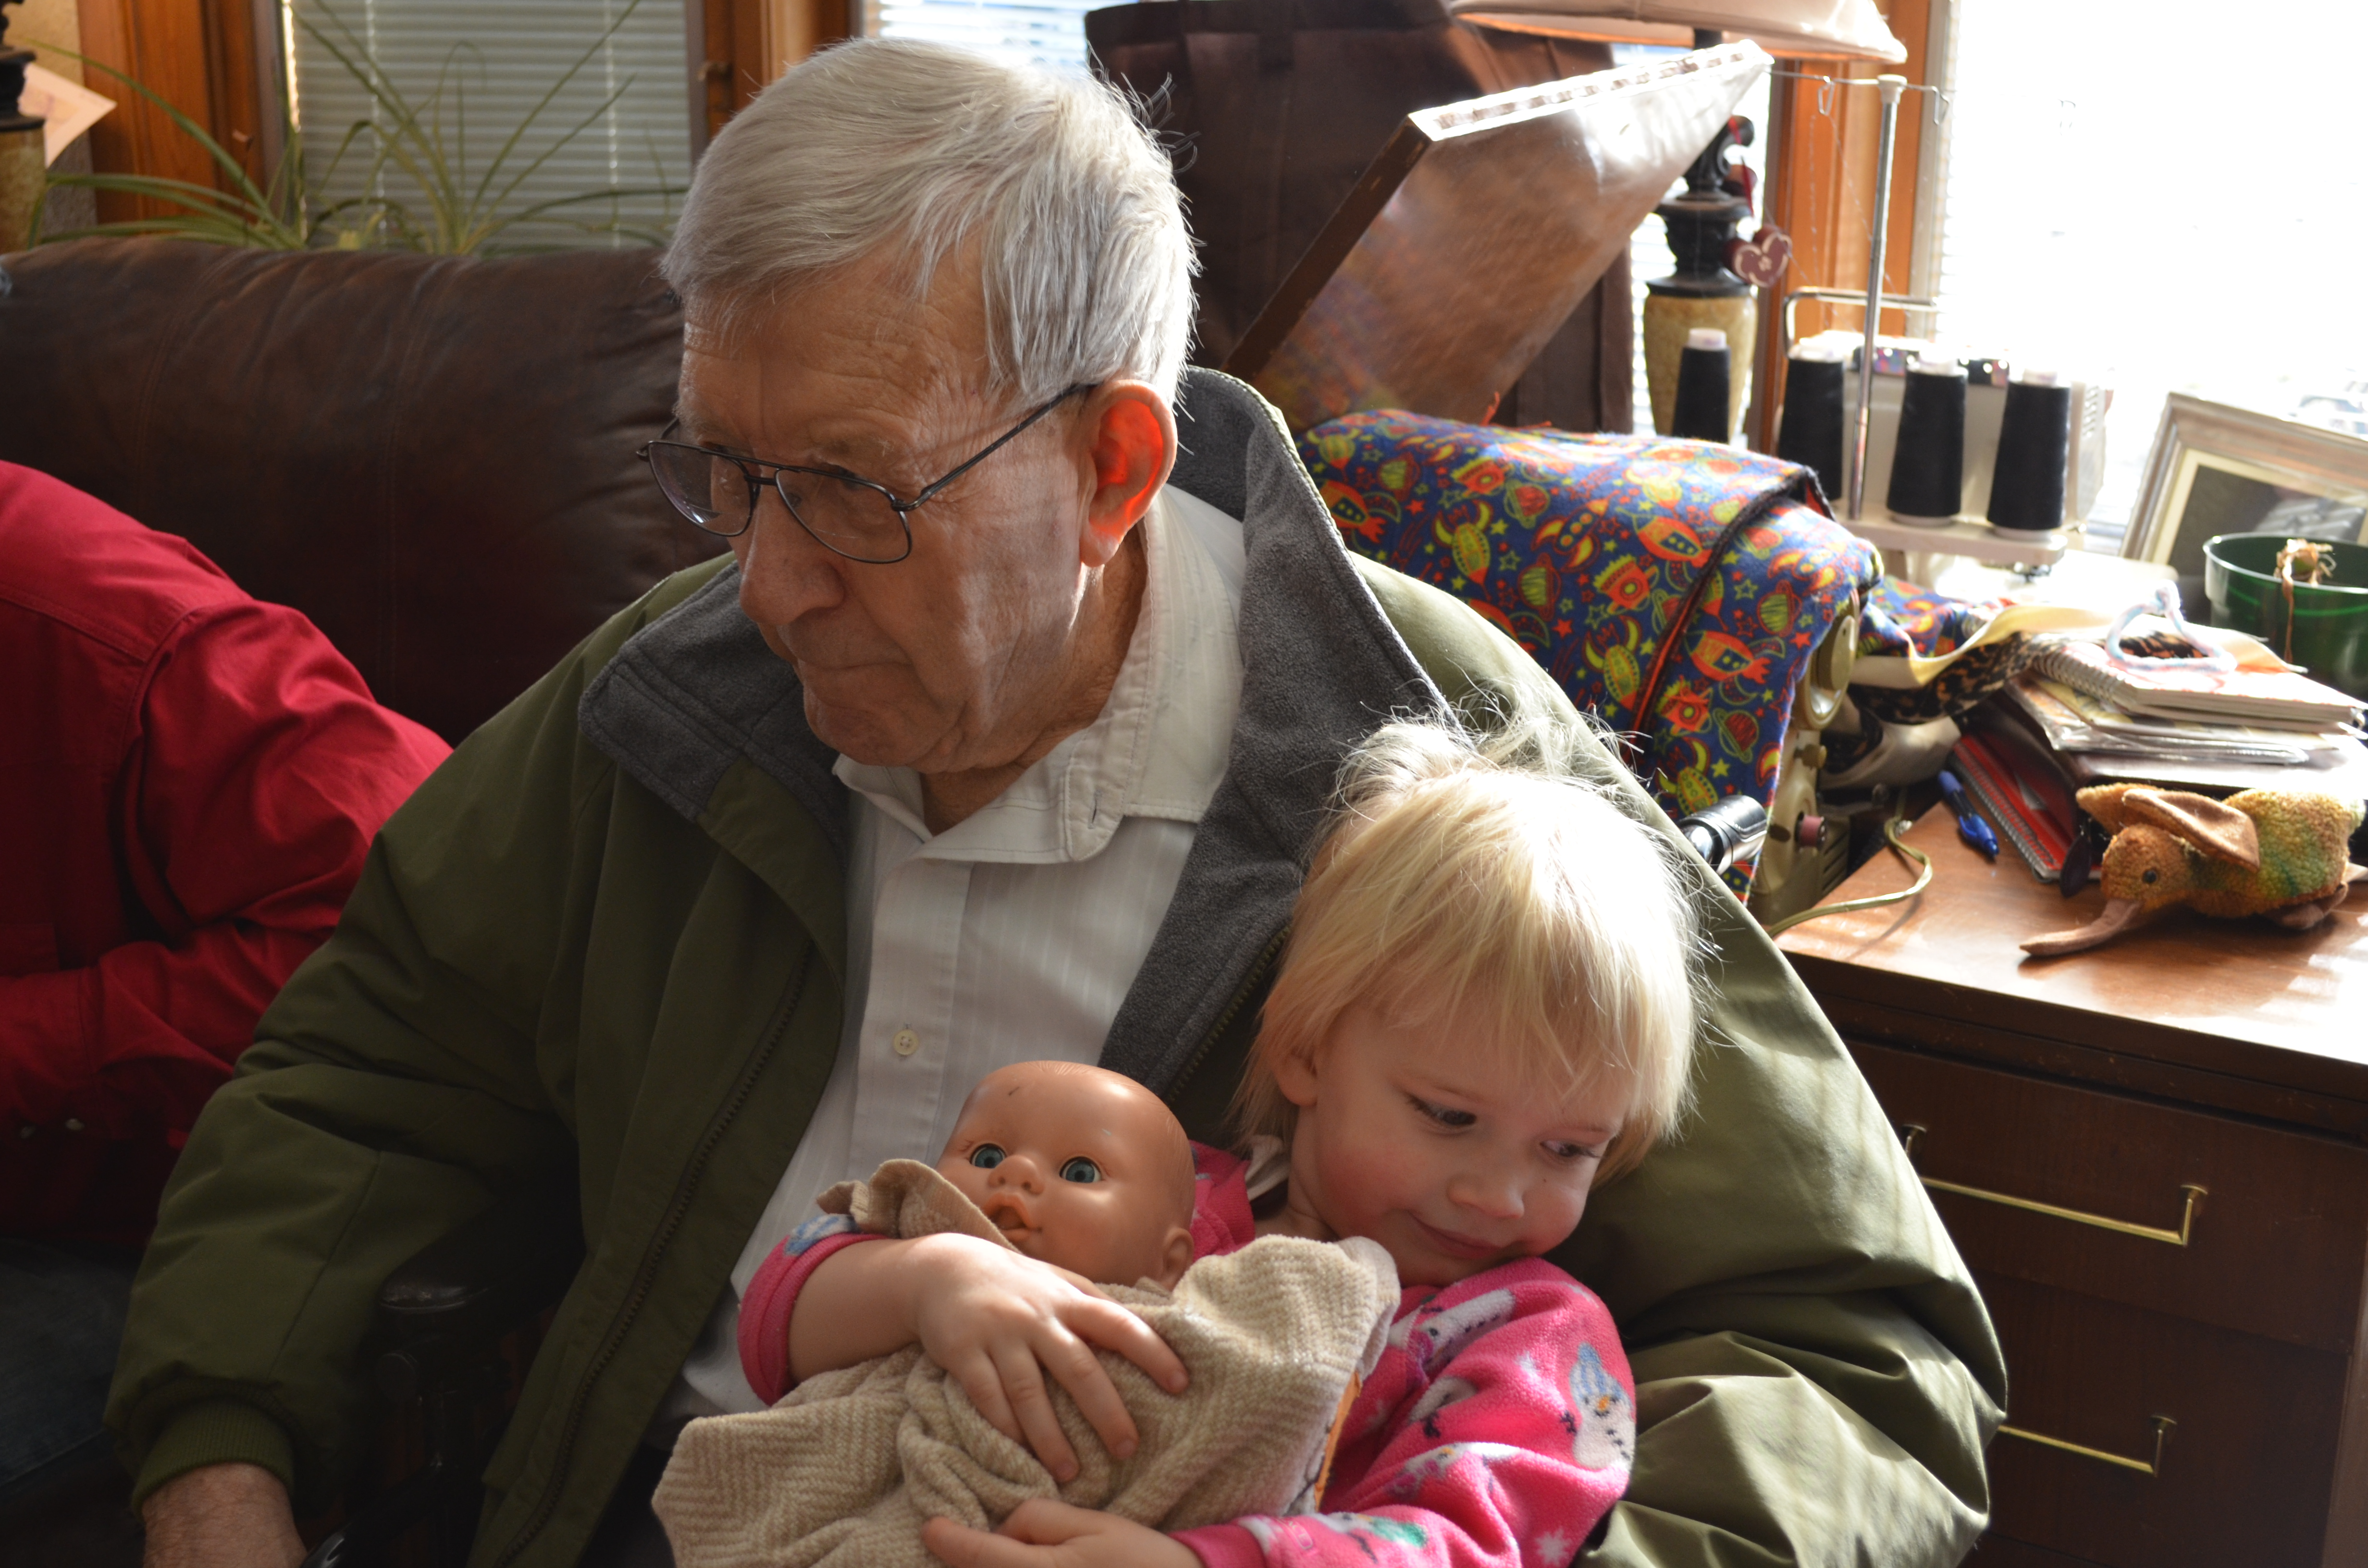 Bad Grandpa Ball Sack Being held by great grandpa